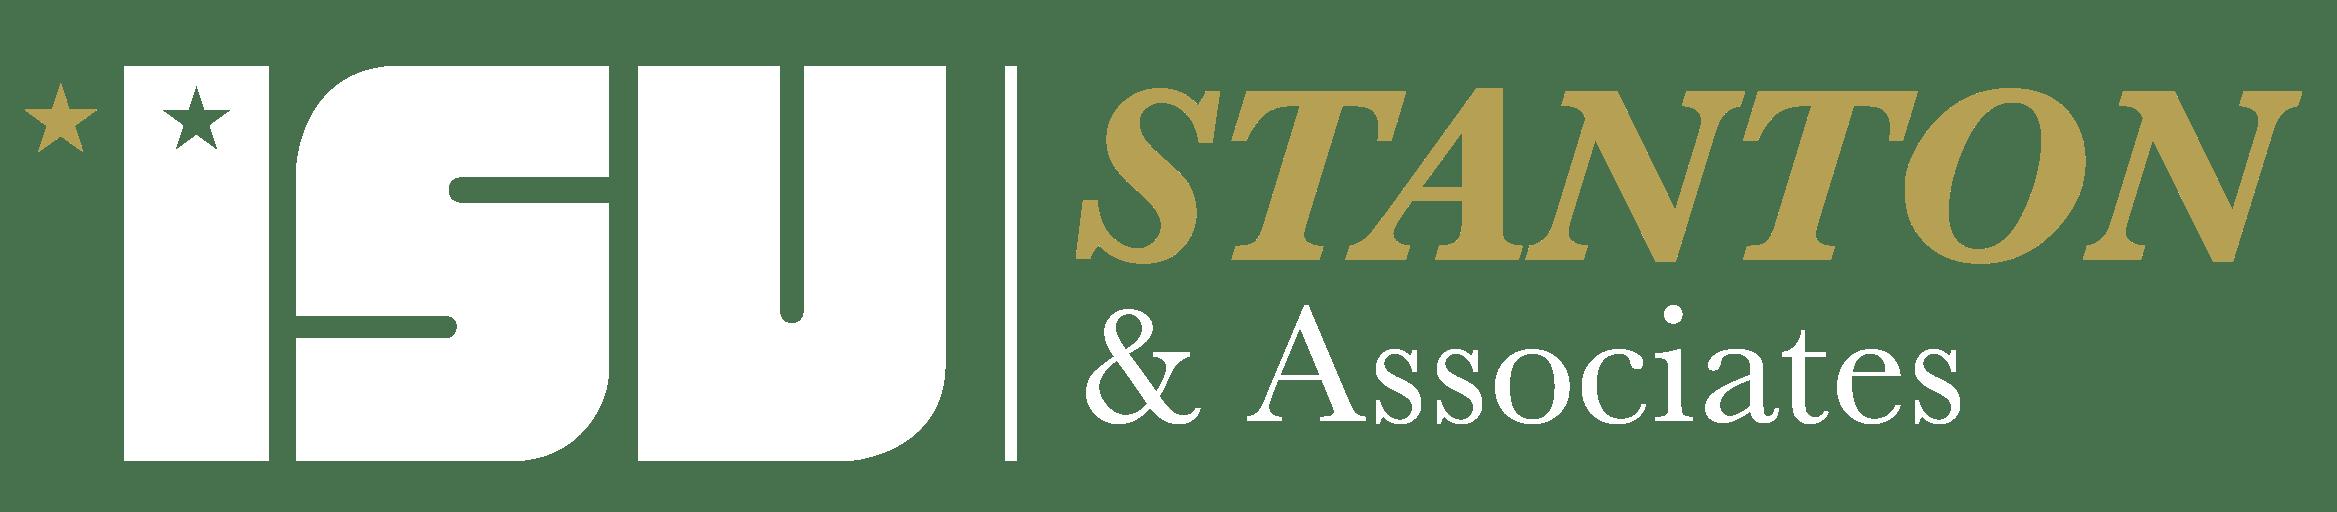 ISU Stanton